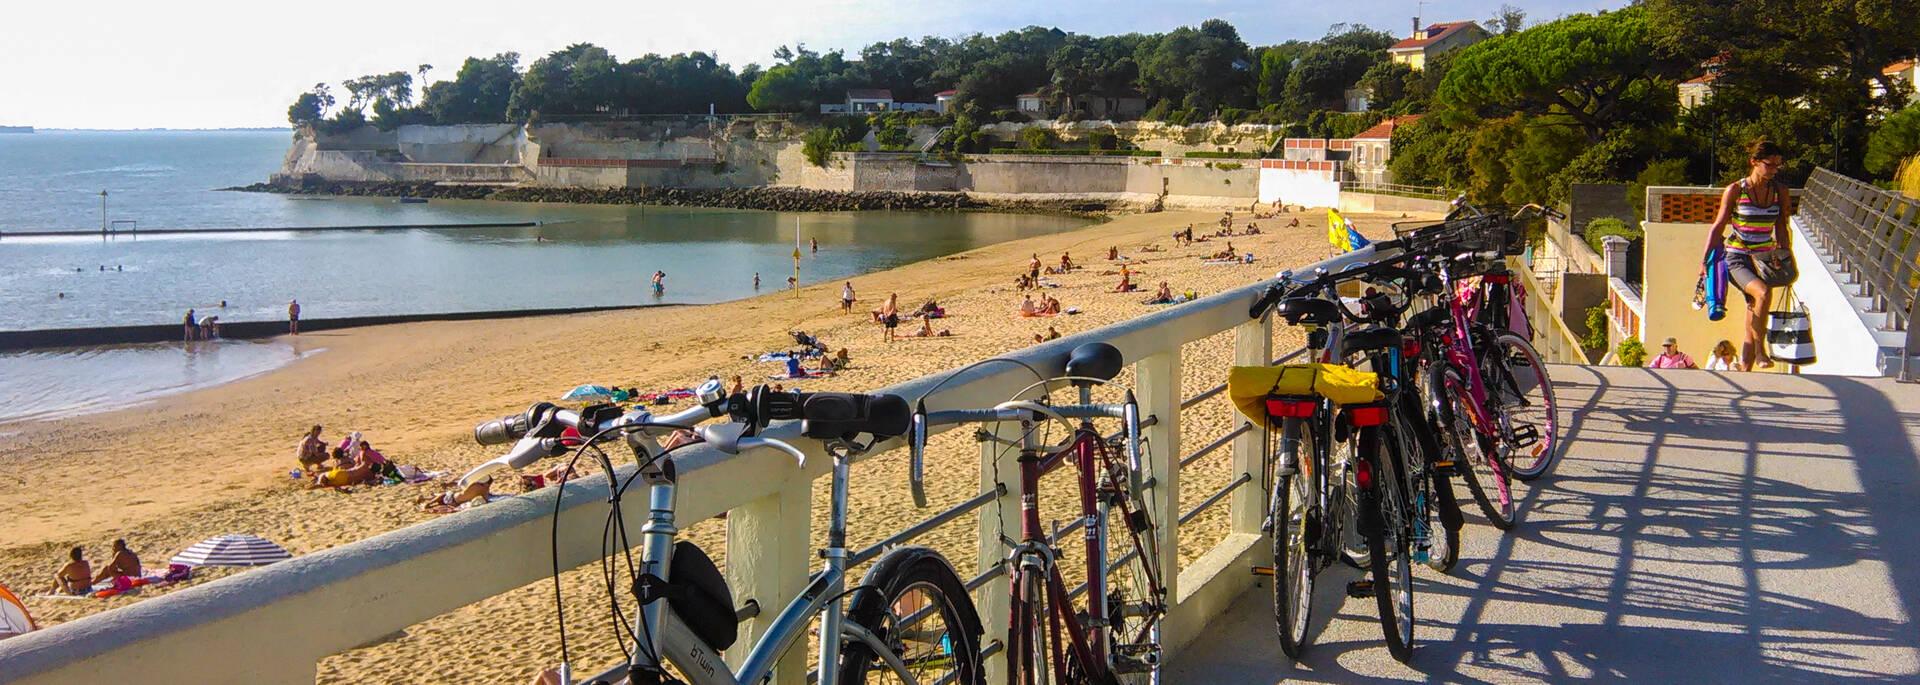 Beach break in Fouras-les-bains - © Office de tourisme Rochefort Océan